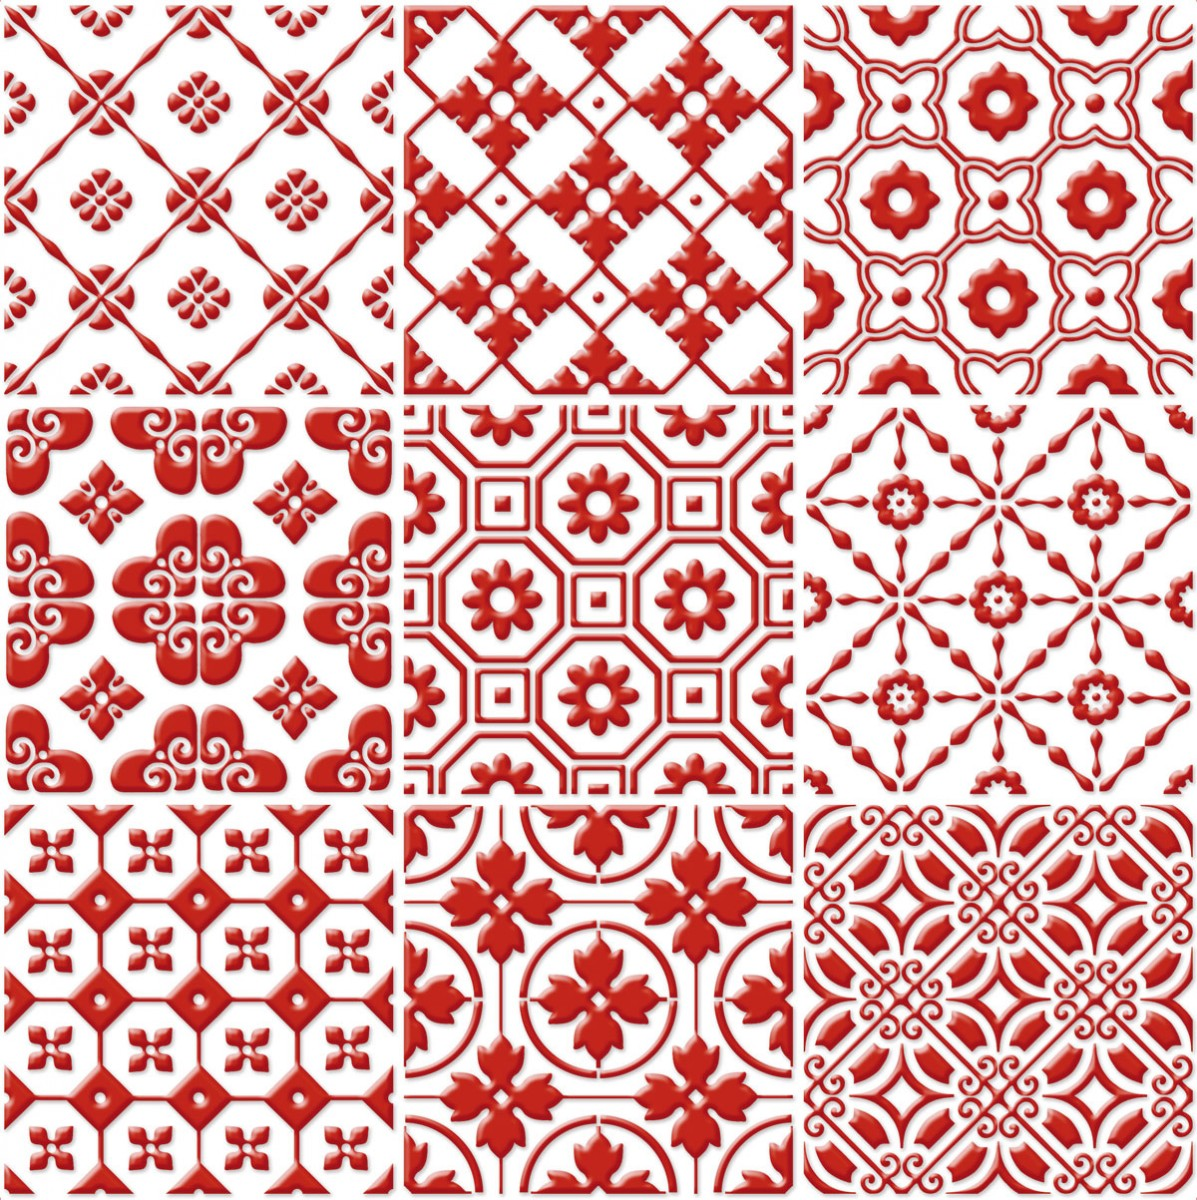 Signorino: Red on White